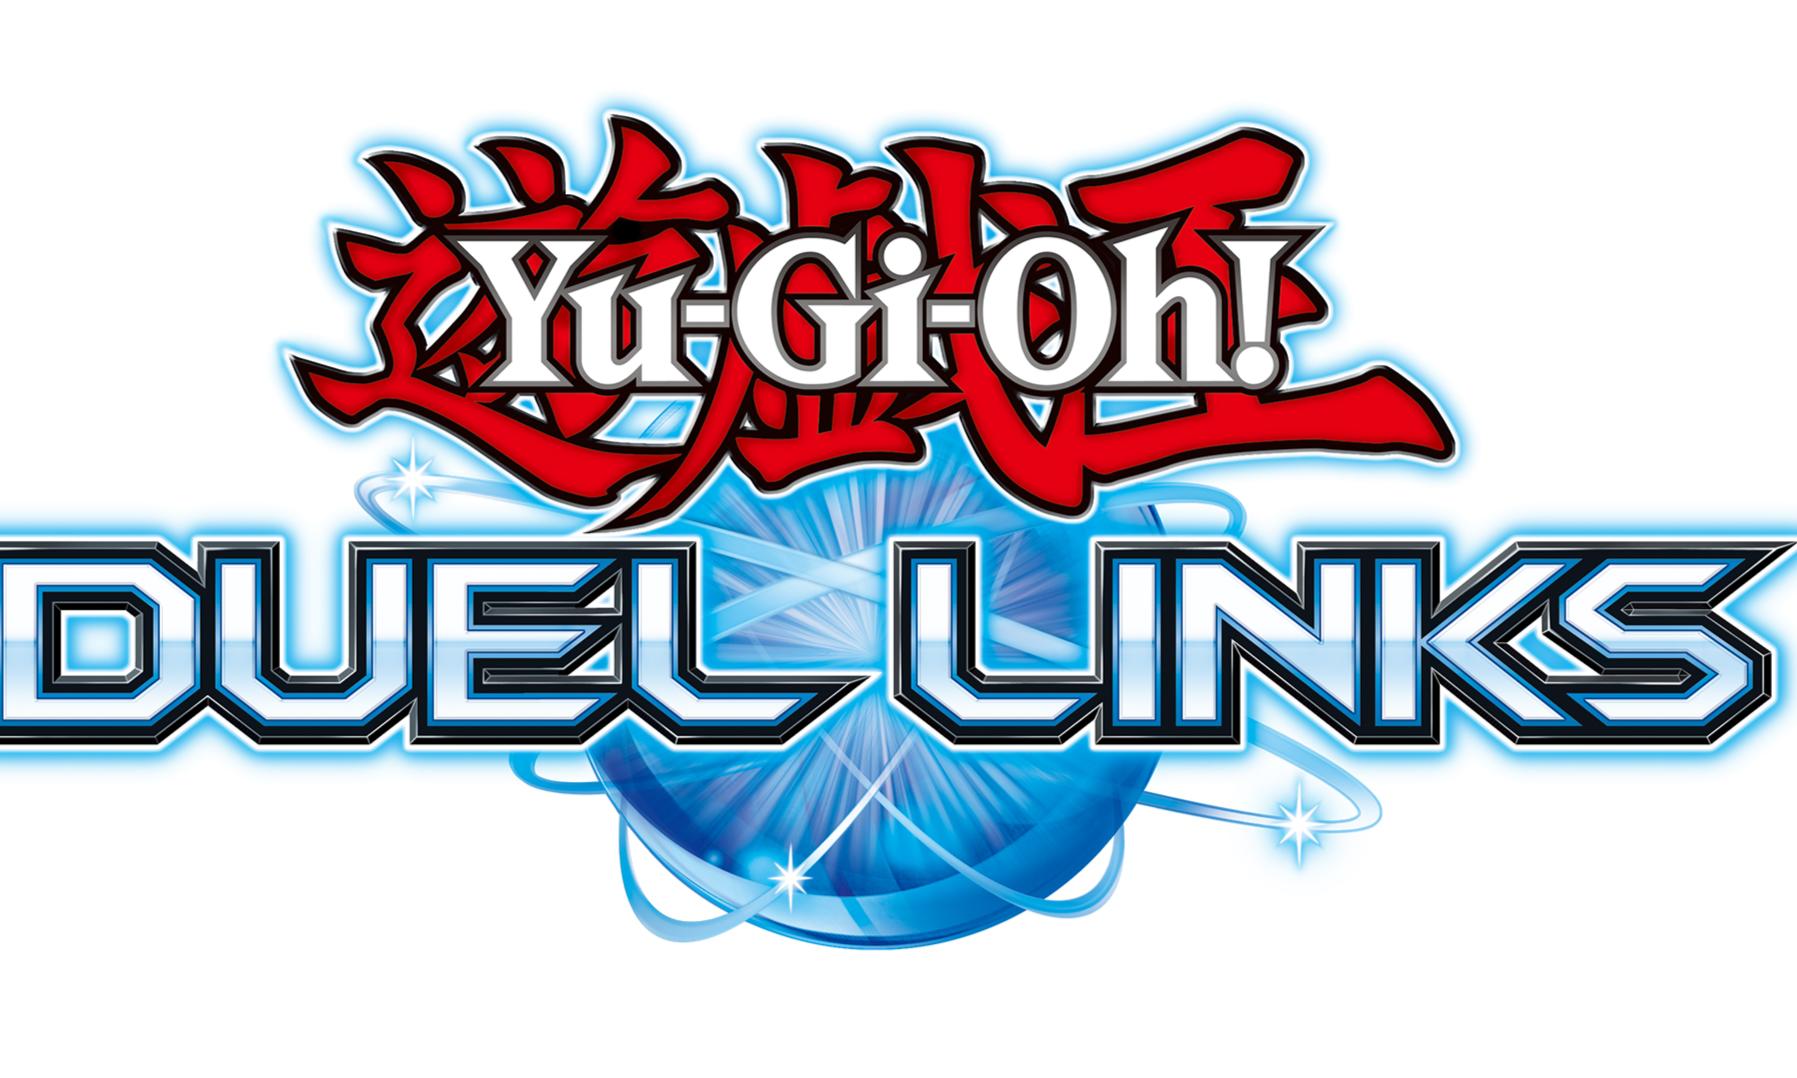 Yu-Gi-Oh Duel links | Gamehag